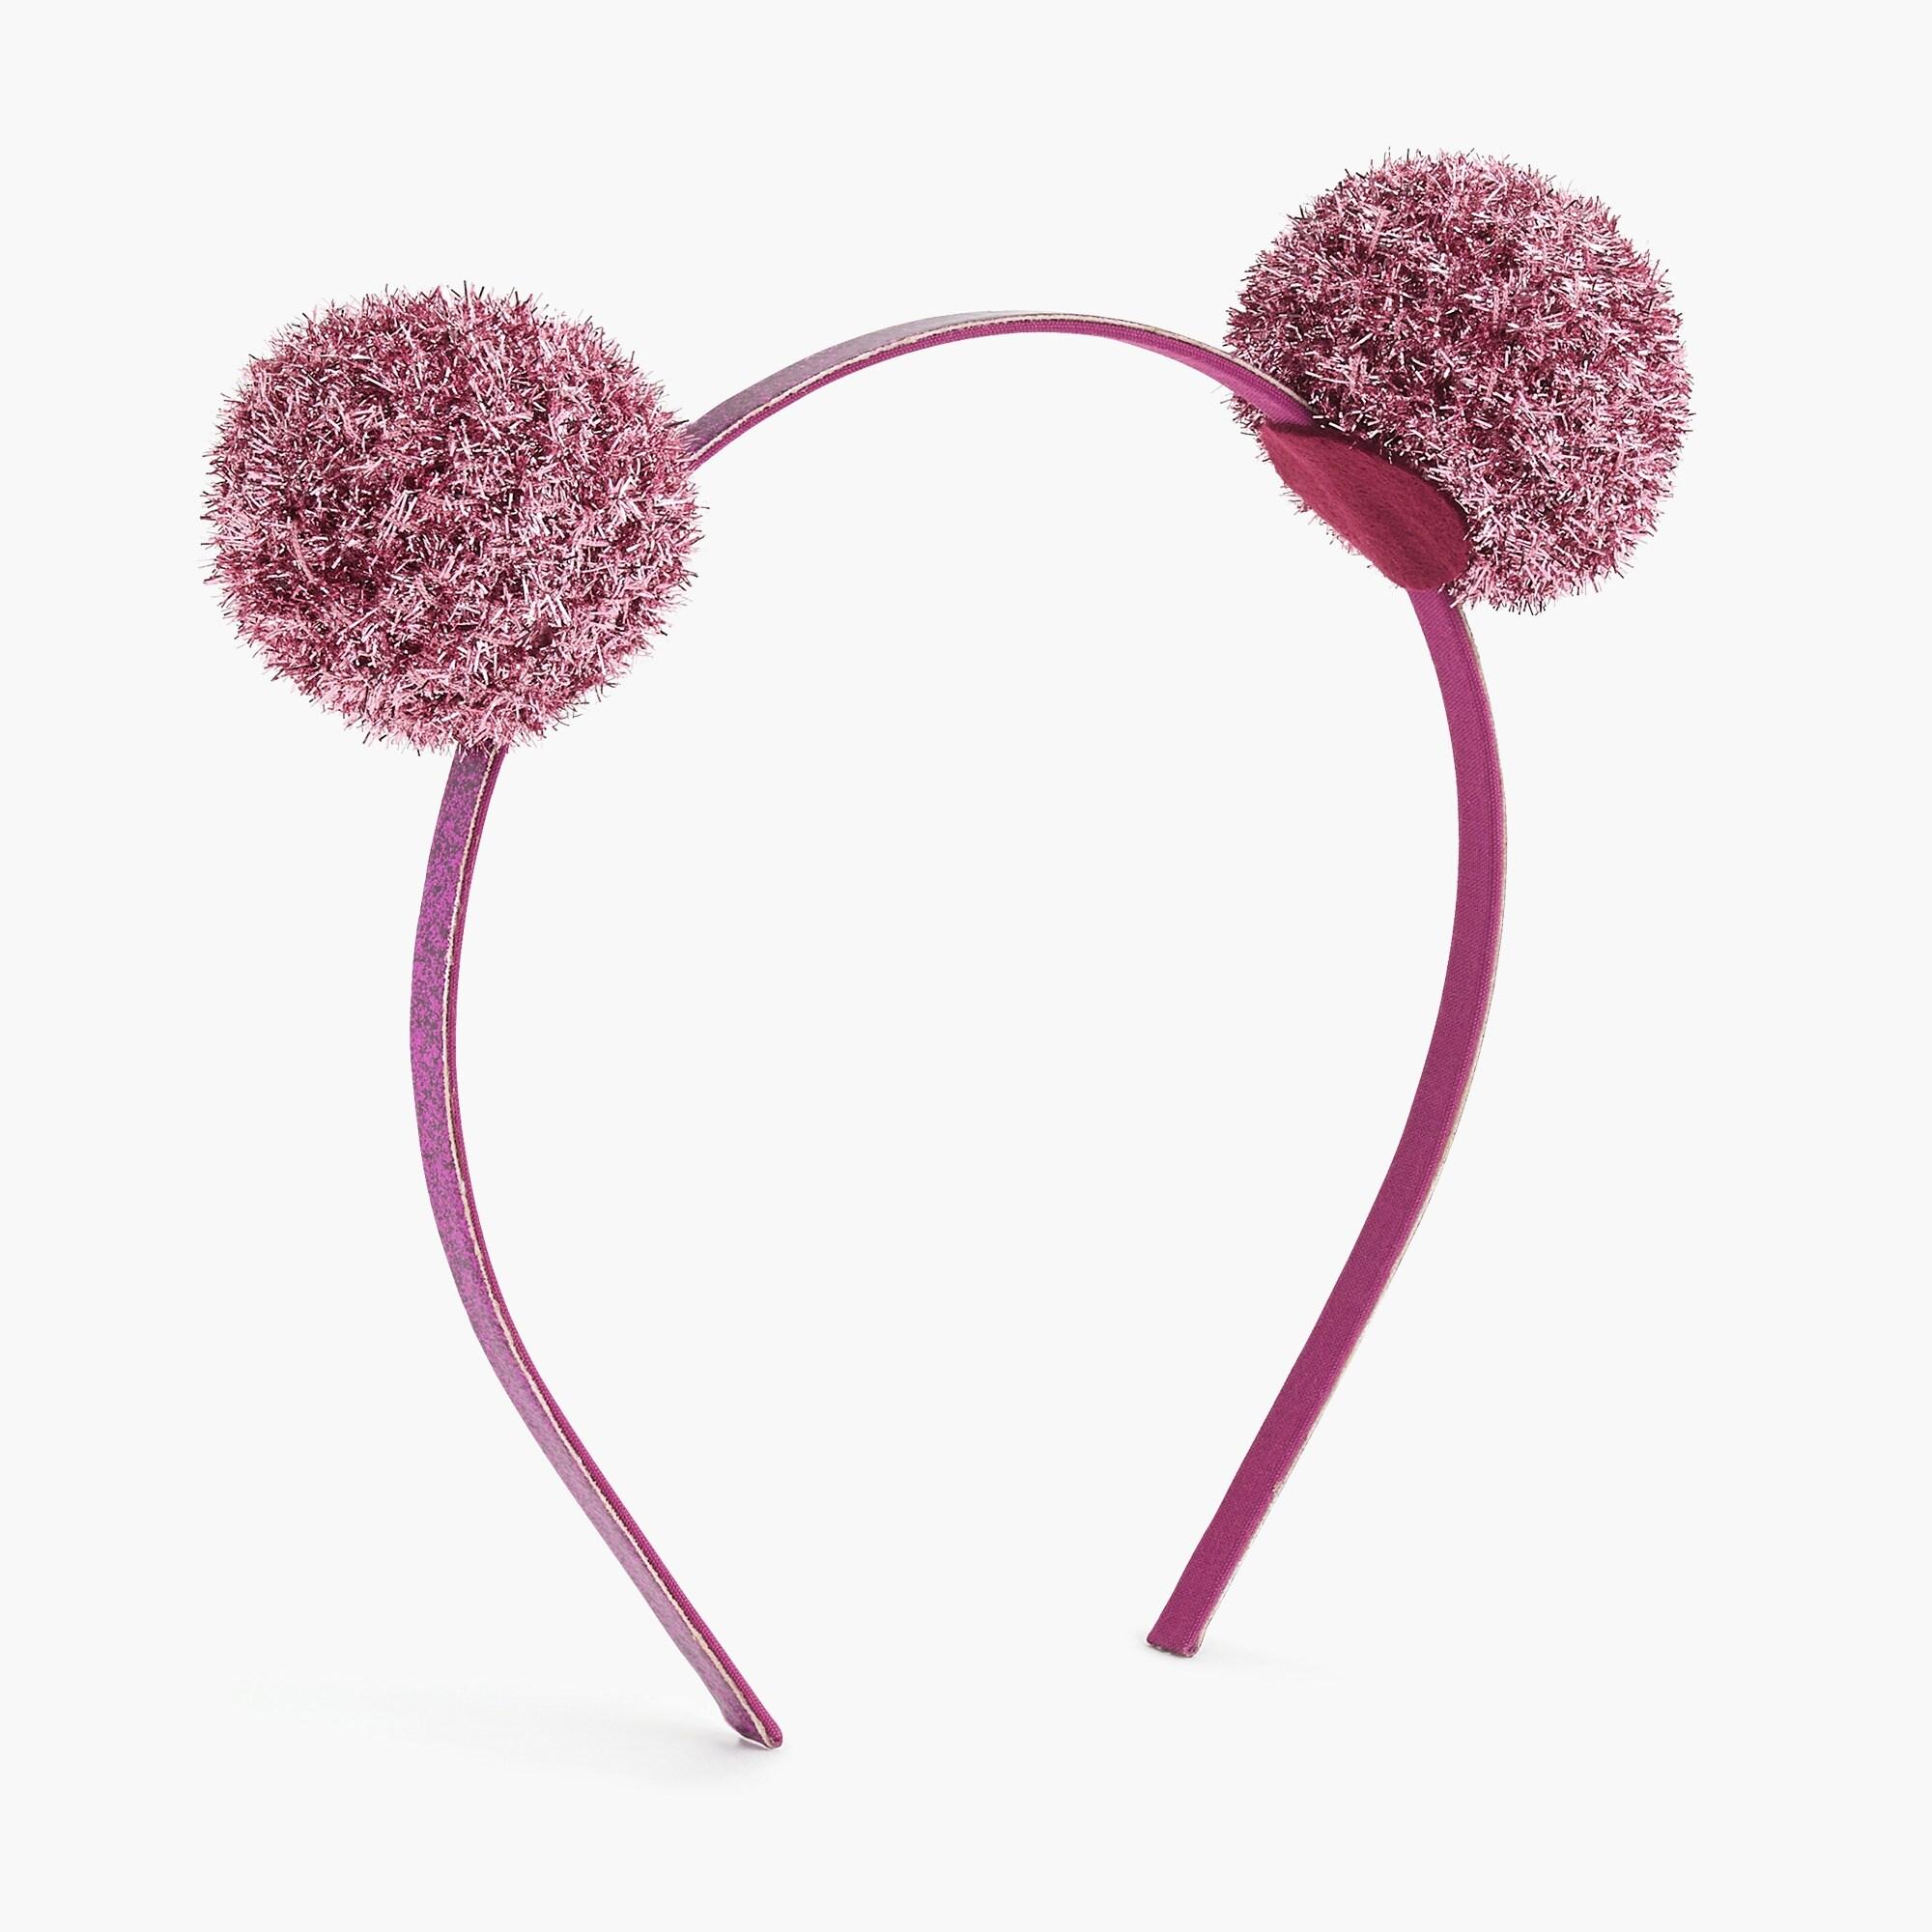 Image 1 for Girls' double-pom headband